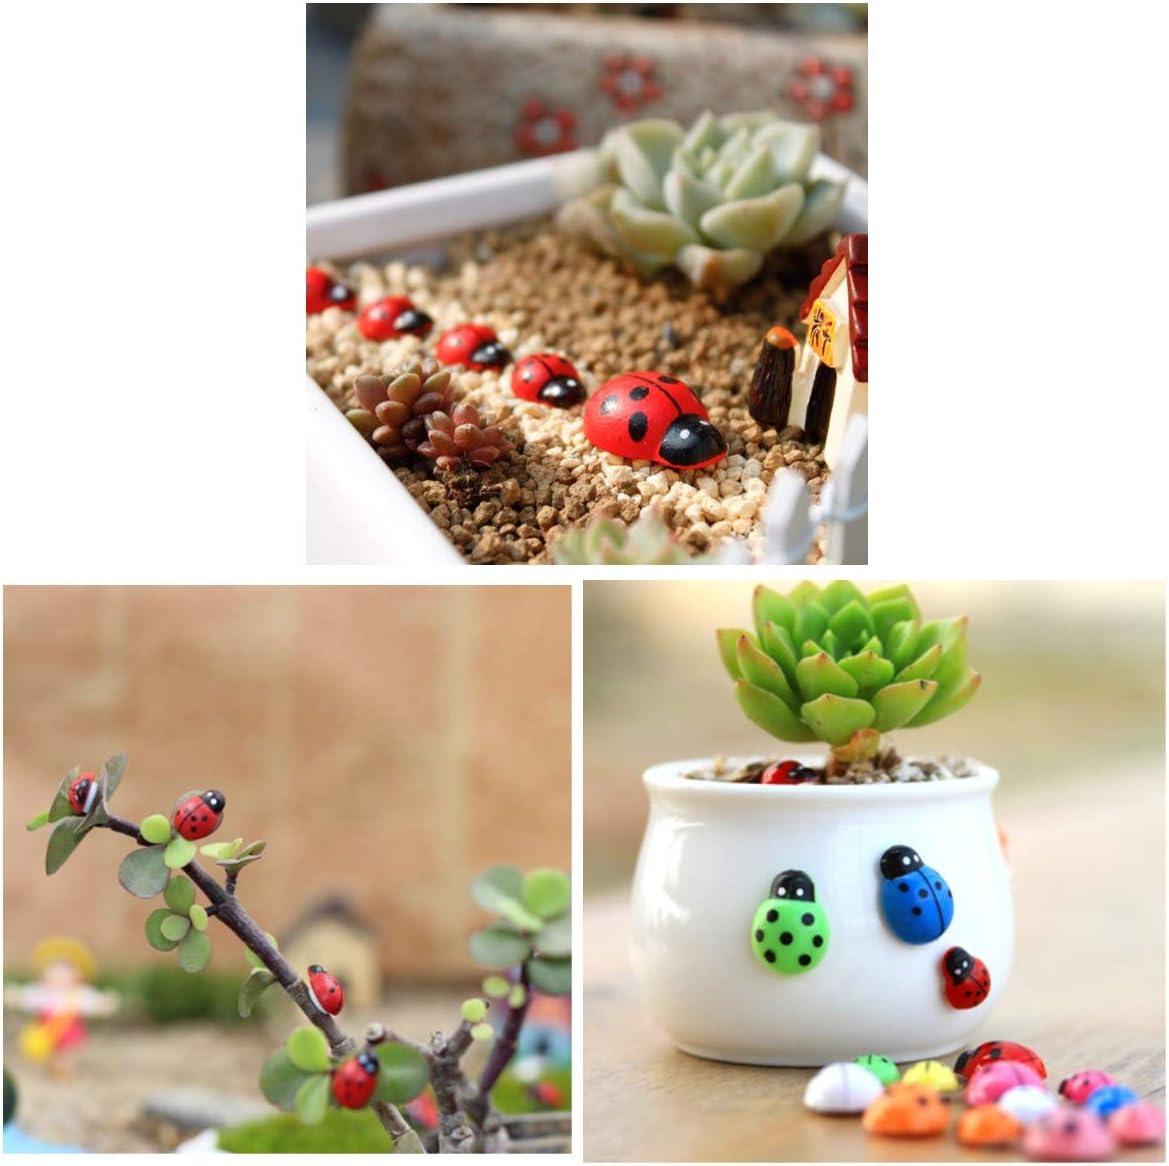 JZK 200 x Mini Wooden Colourful Ladybird Ladybugs Adhesive 10x13mm Ornament for Wedding Favour Box Birthday Decoration Scrapbooking